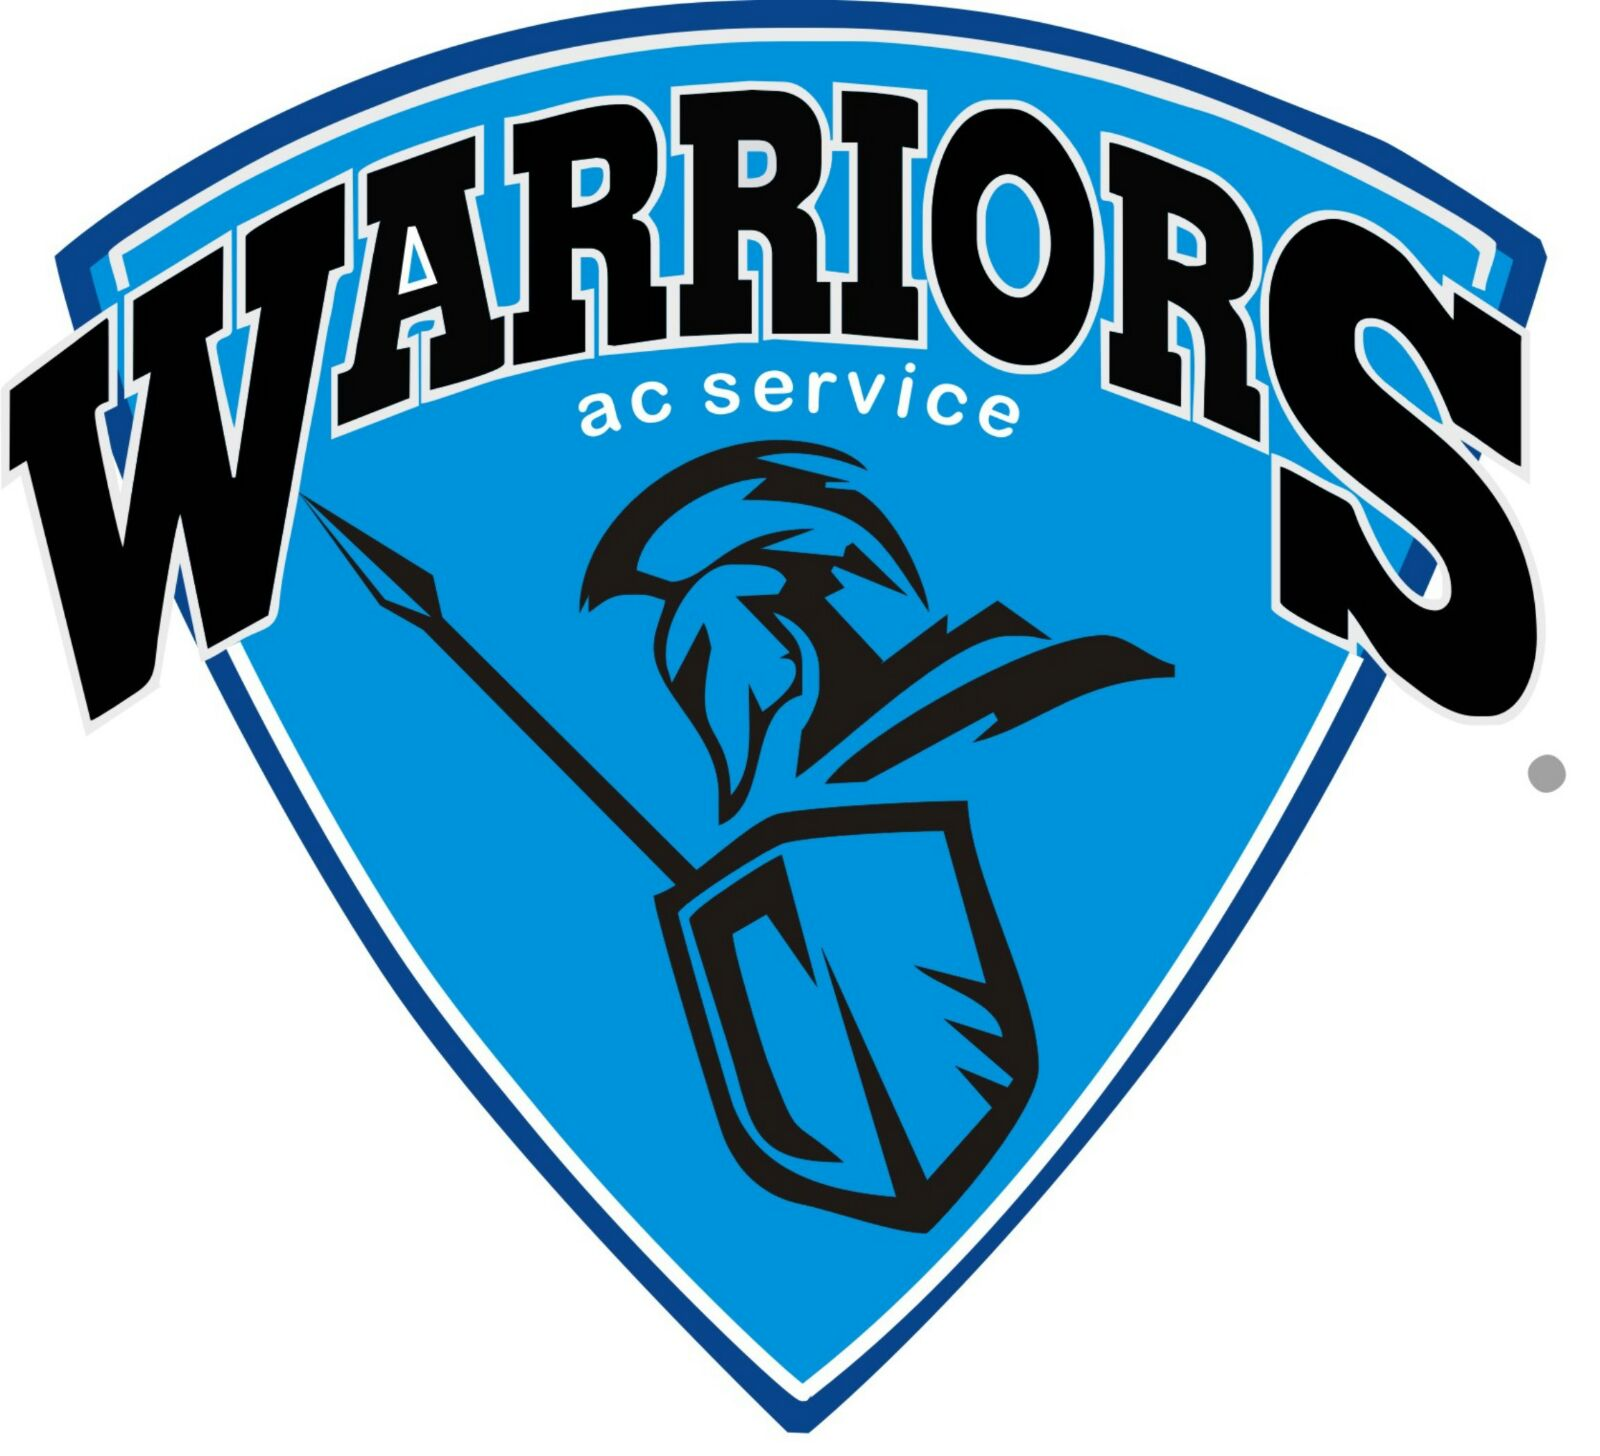 Di Warriors Service Ac Solo Lowongan Kerja Terbaru Solo Raya 2016